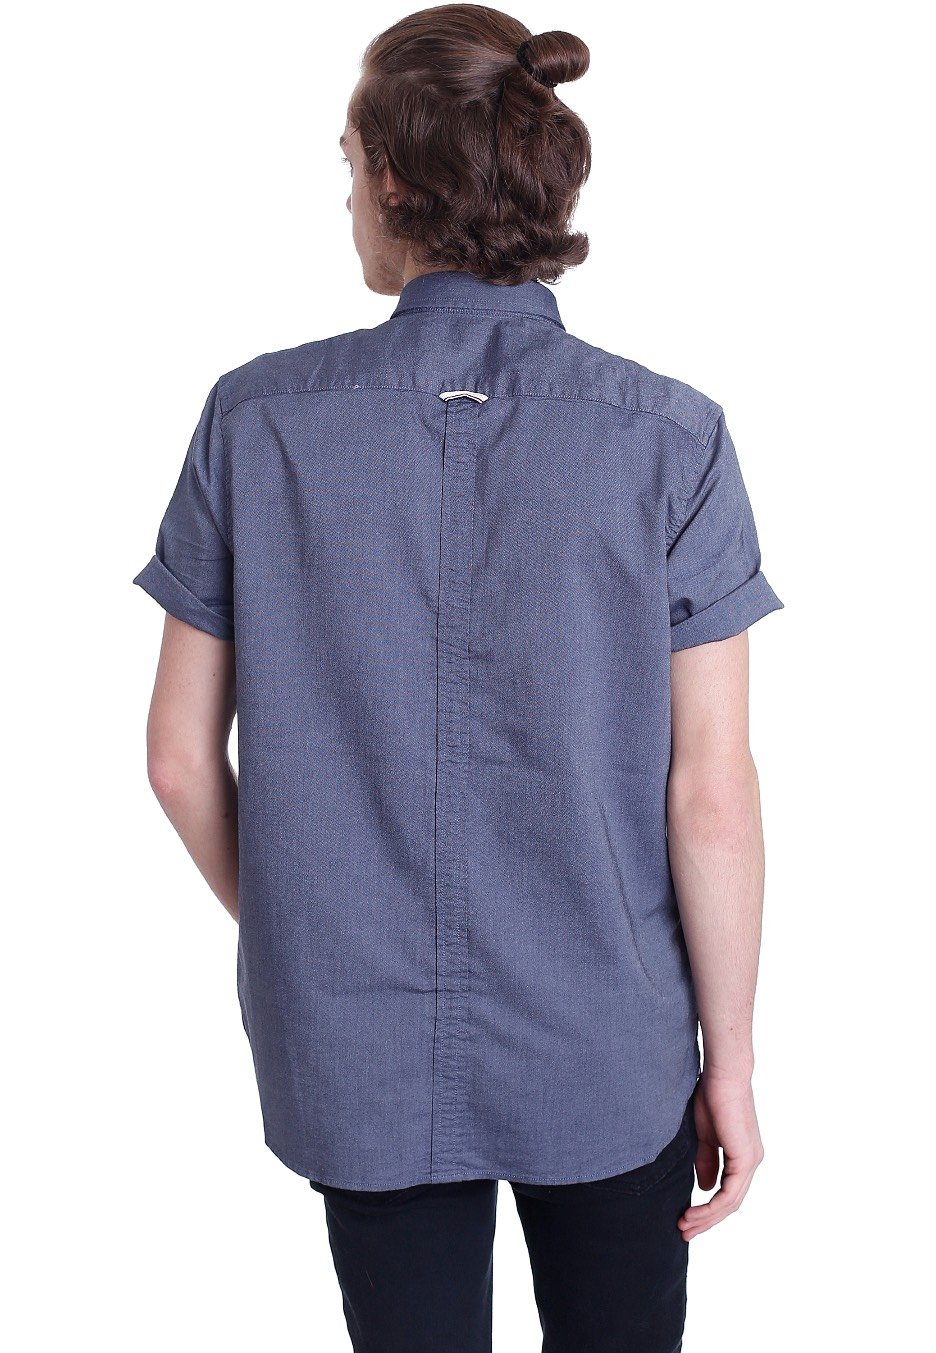 Fred Perry - Classic Oxford S S Dark Carbon - Skjorta - Streetwear ... 17d8099532919